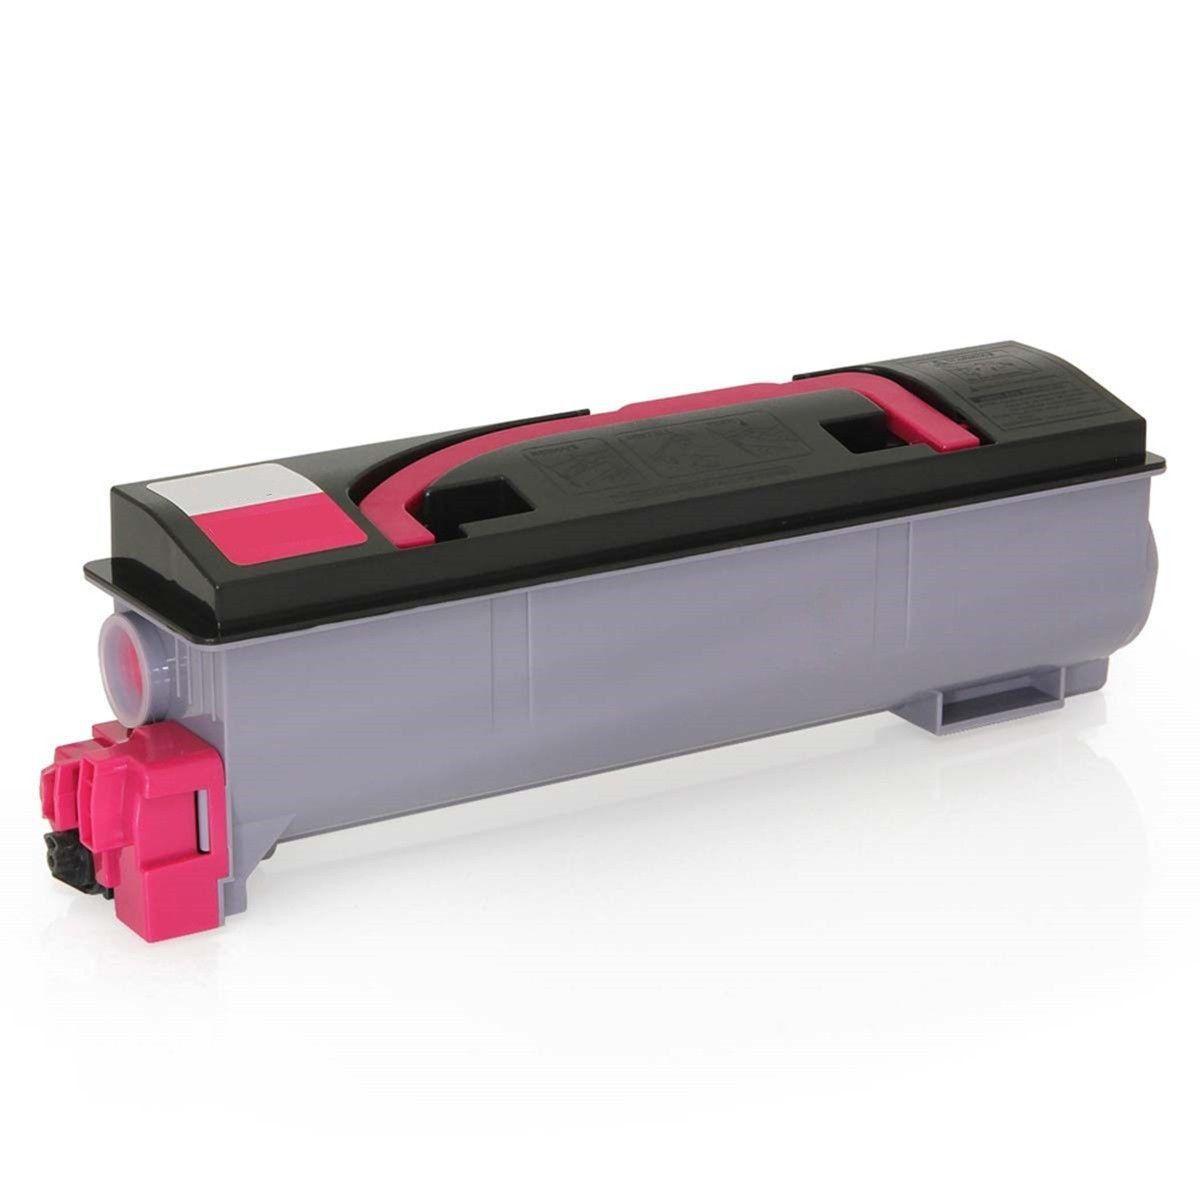 Compatível: Toner TK-562M TK562 para Kyocera C5300 C5350 C5300dn C5350dn FSC5300 FSC5350 FSC5300dn / Magenta / 10.000